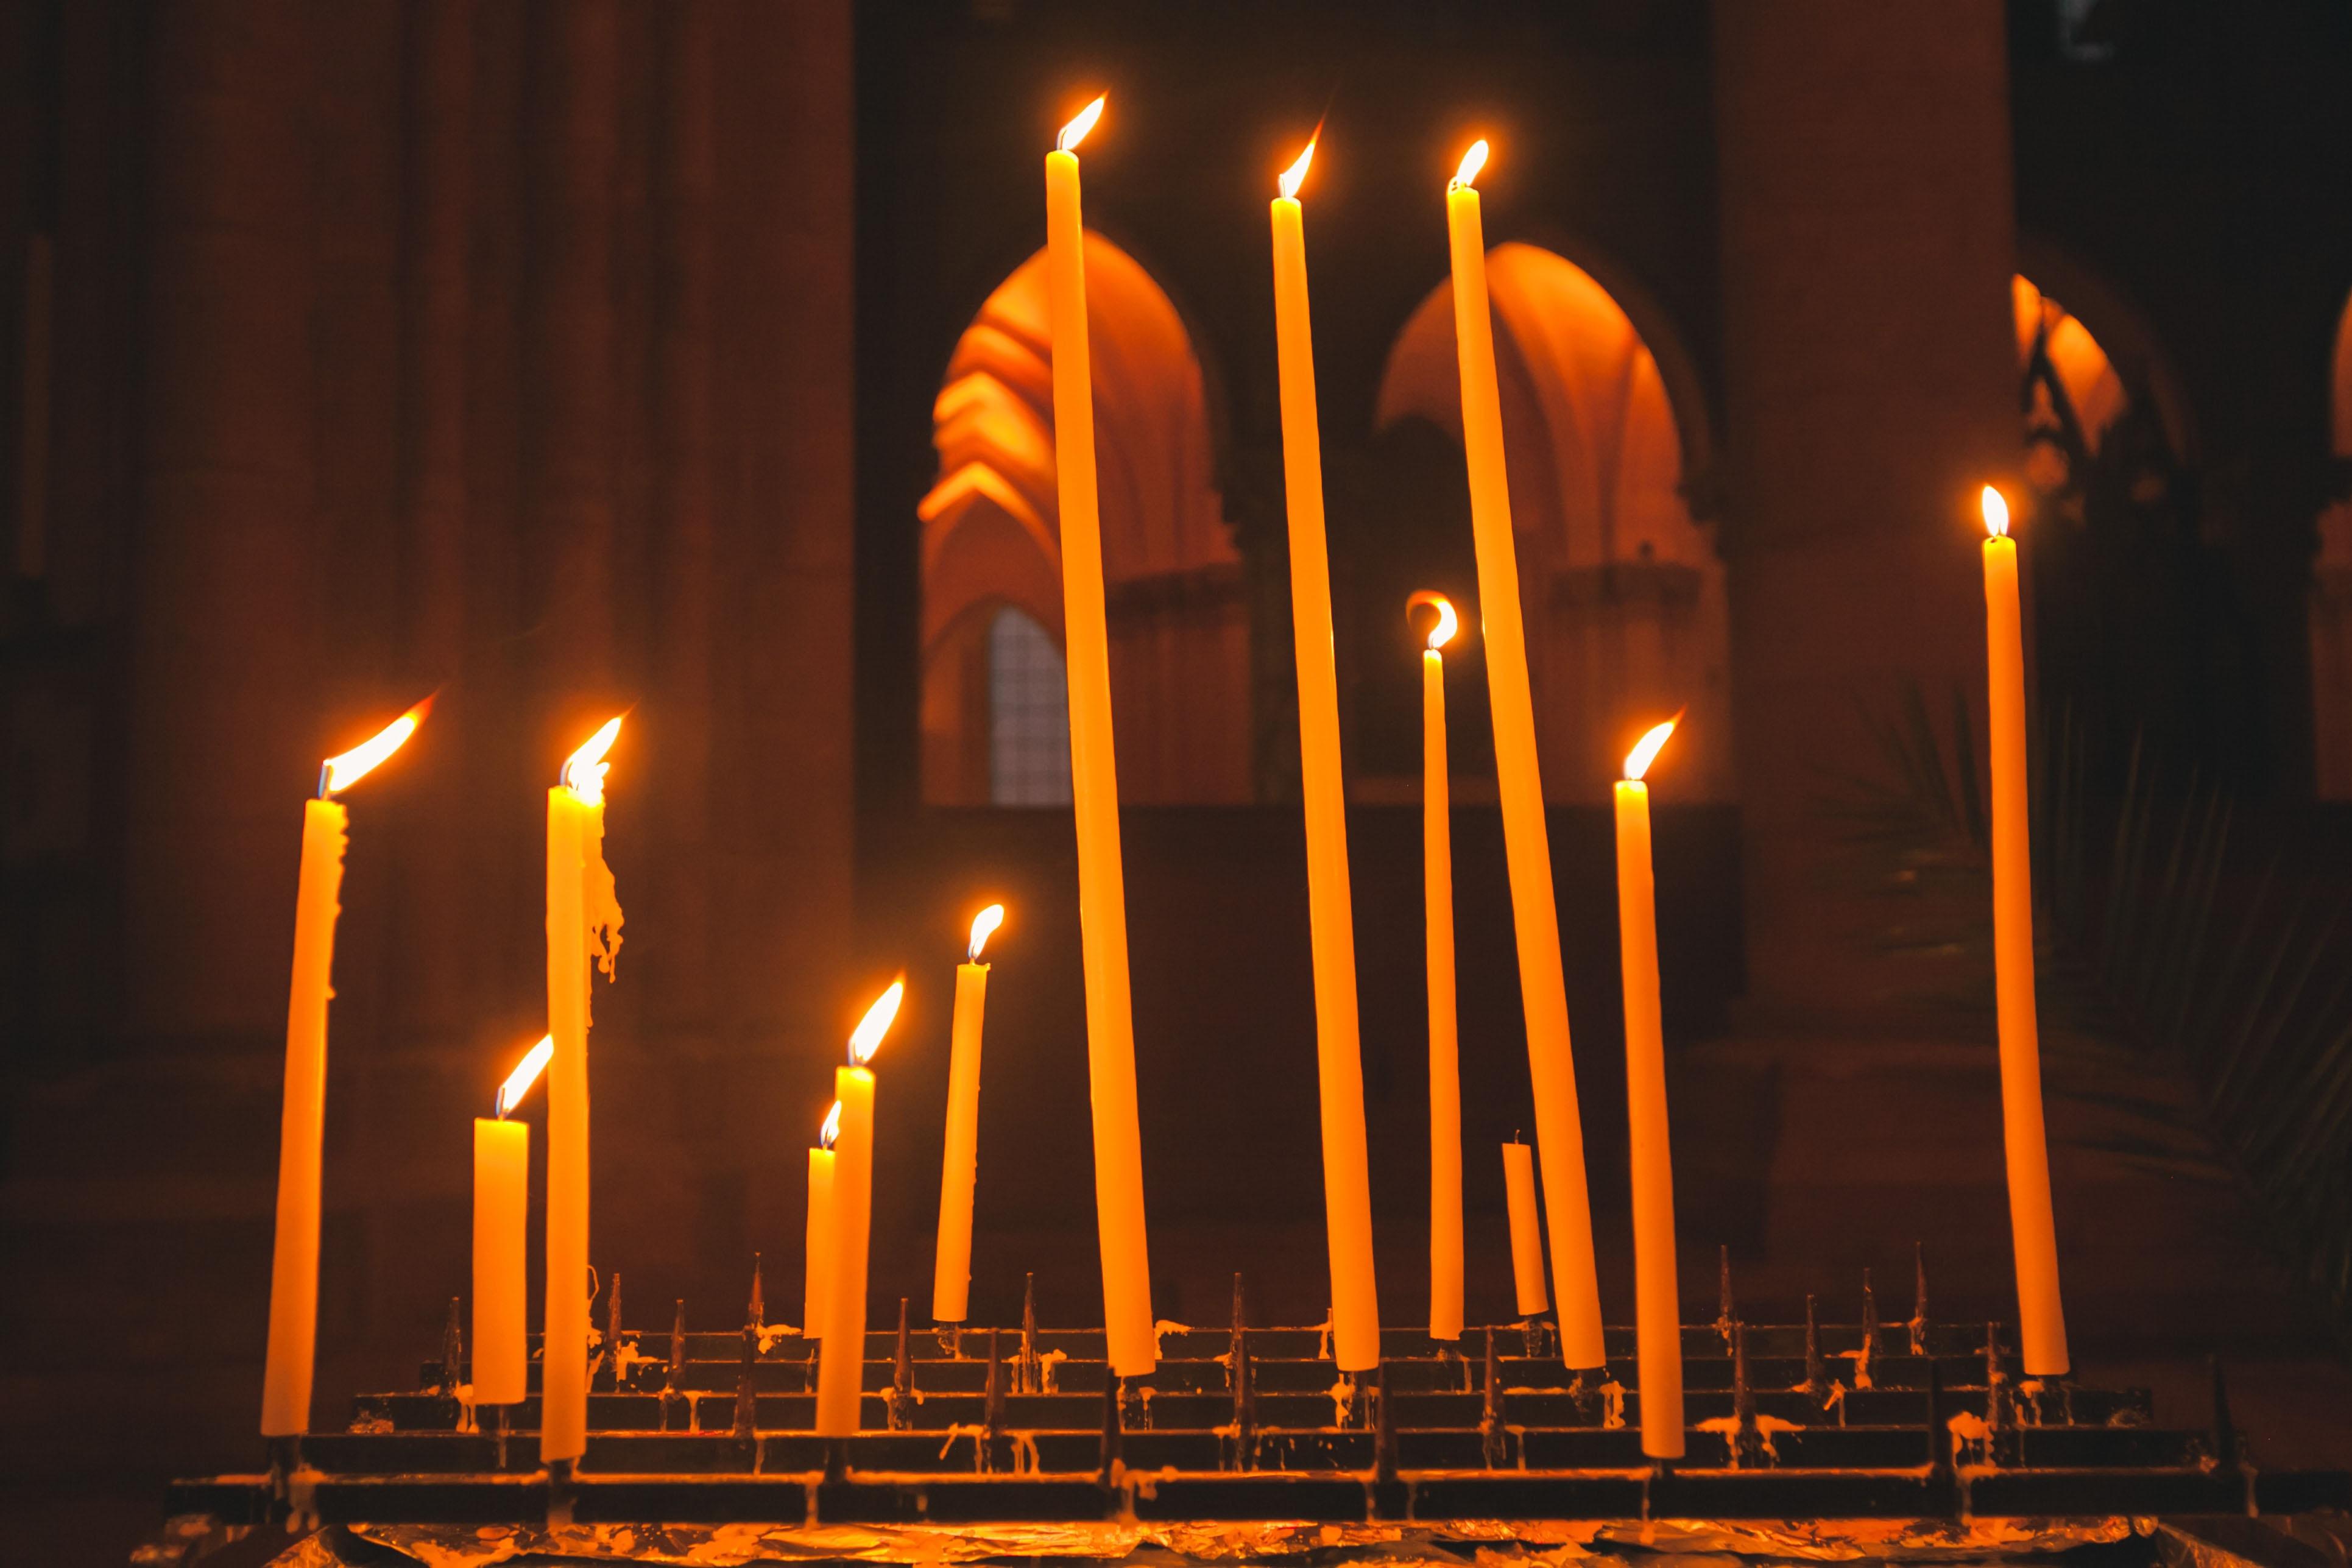 Tall candles in a church.